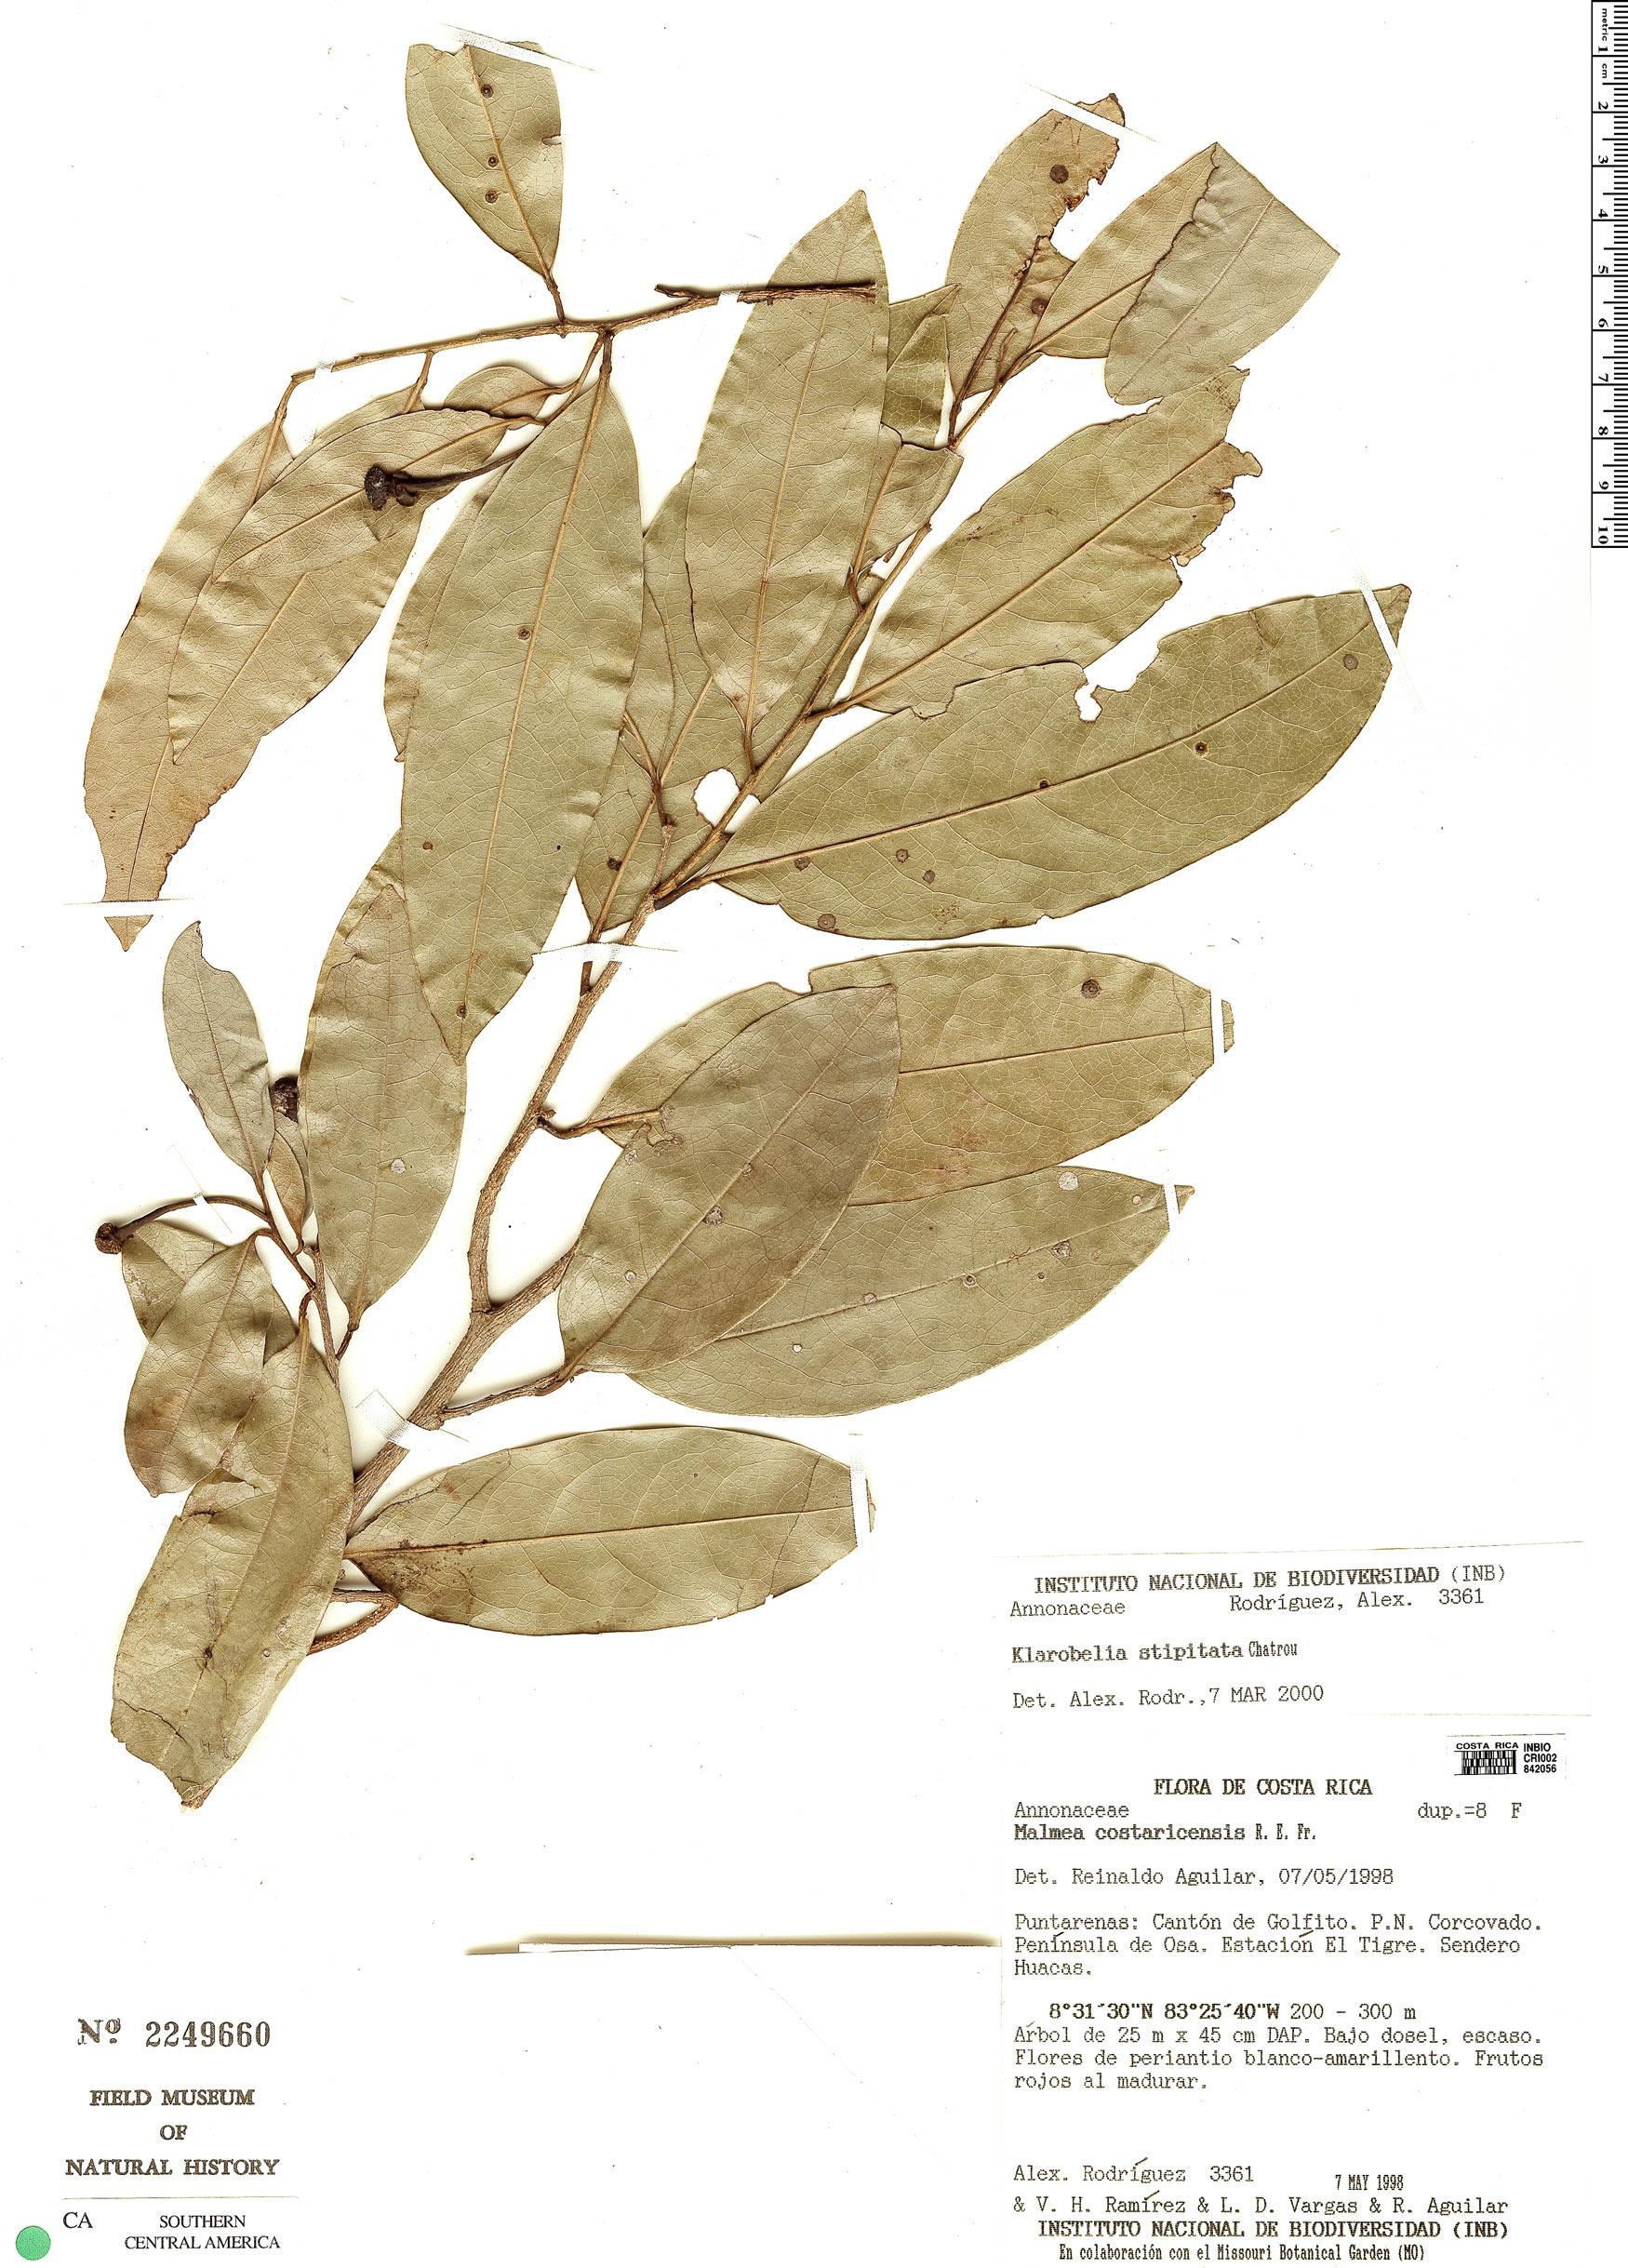 Espécime: Klarobelia stipitata